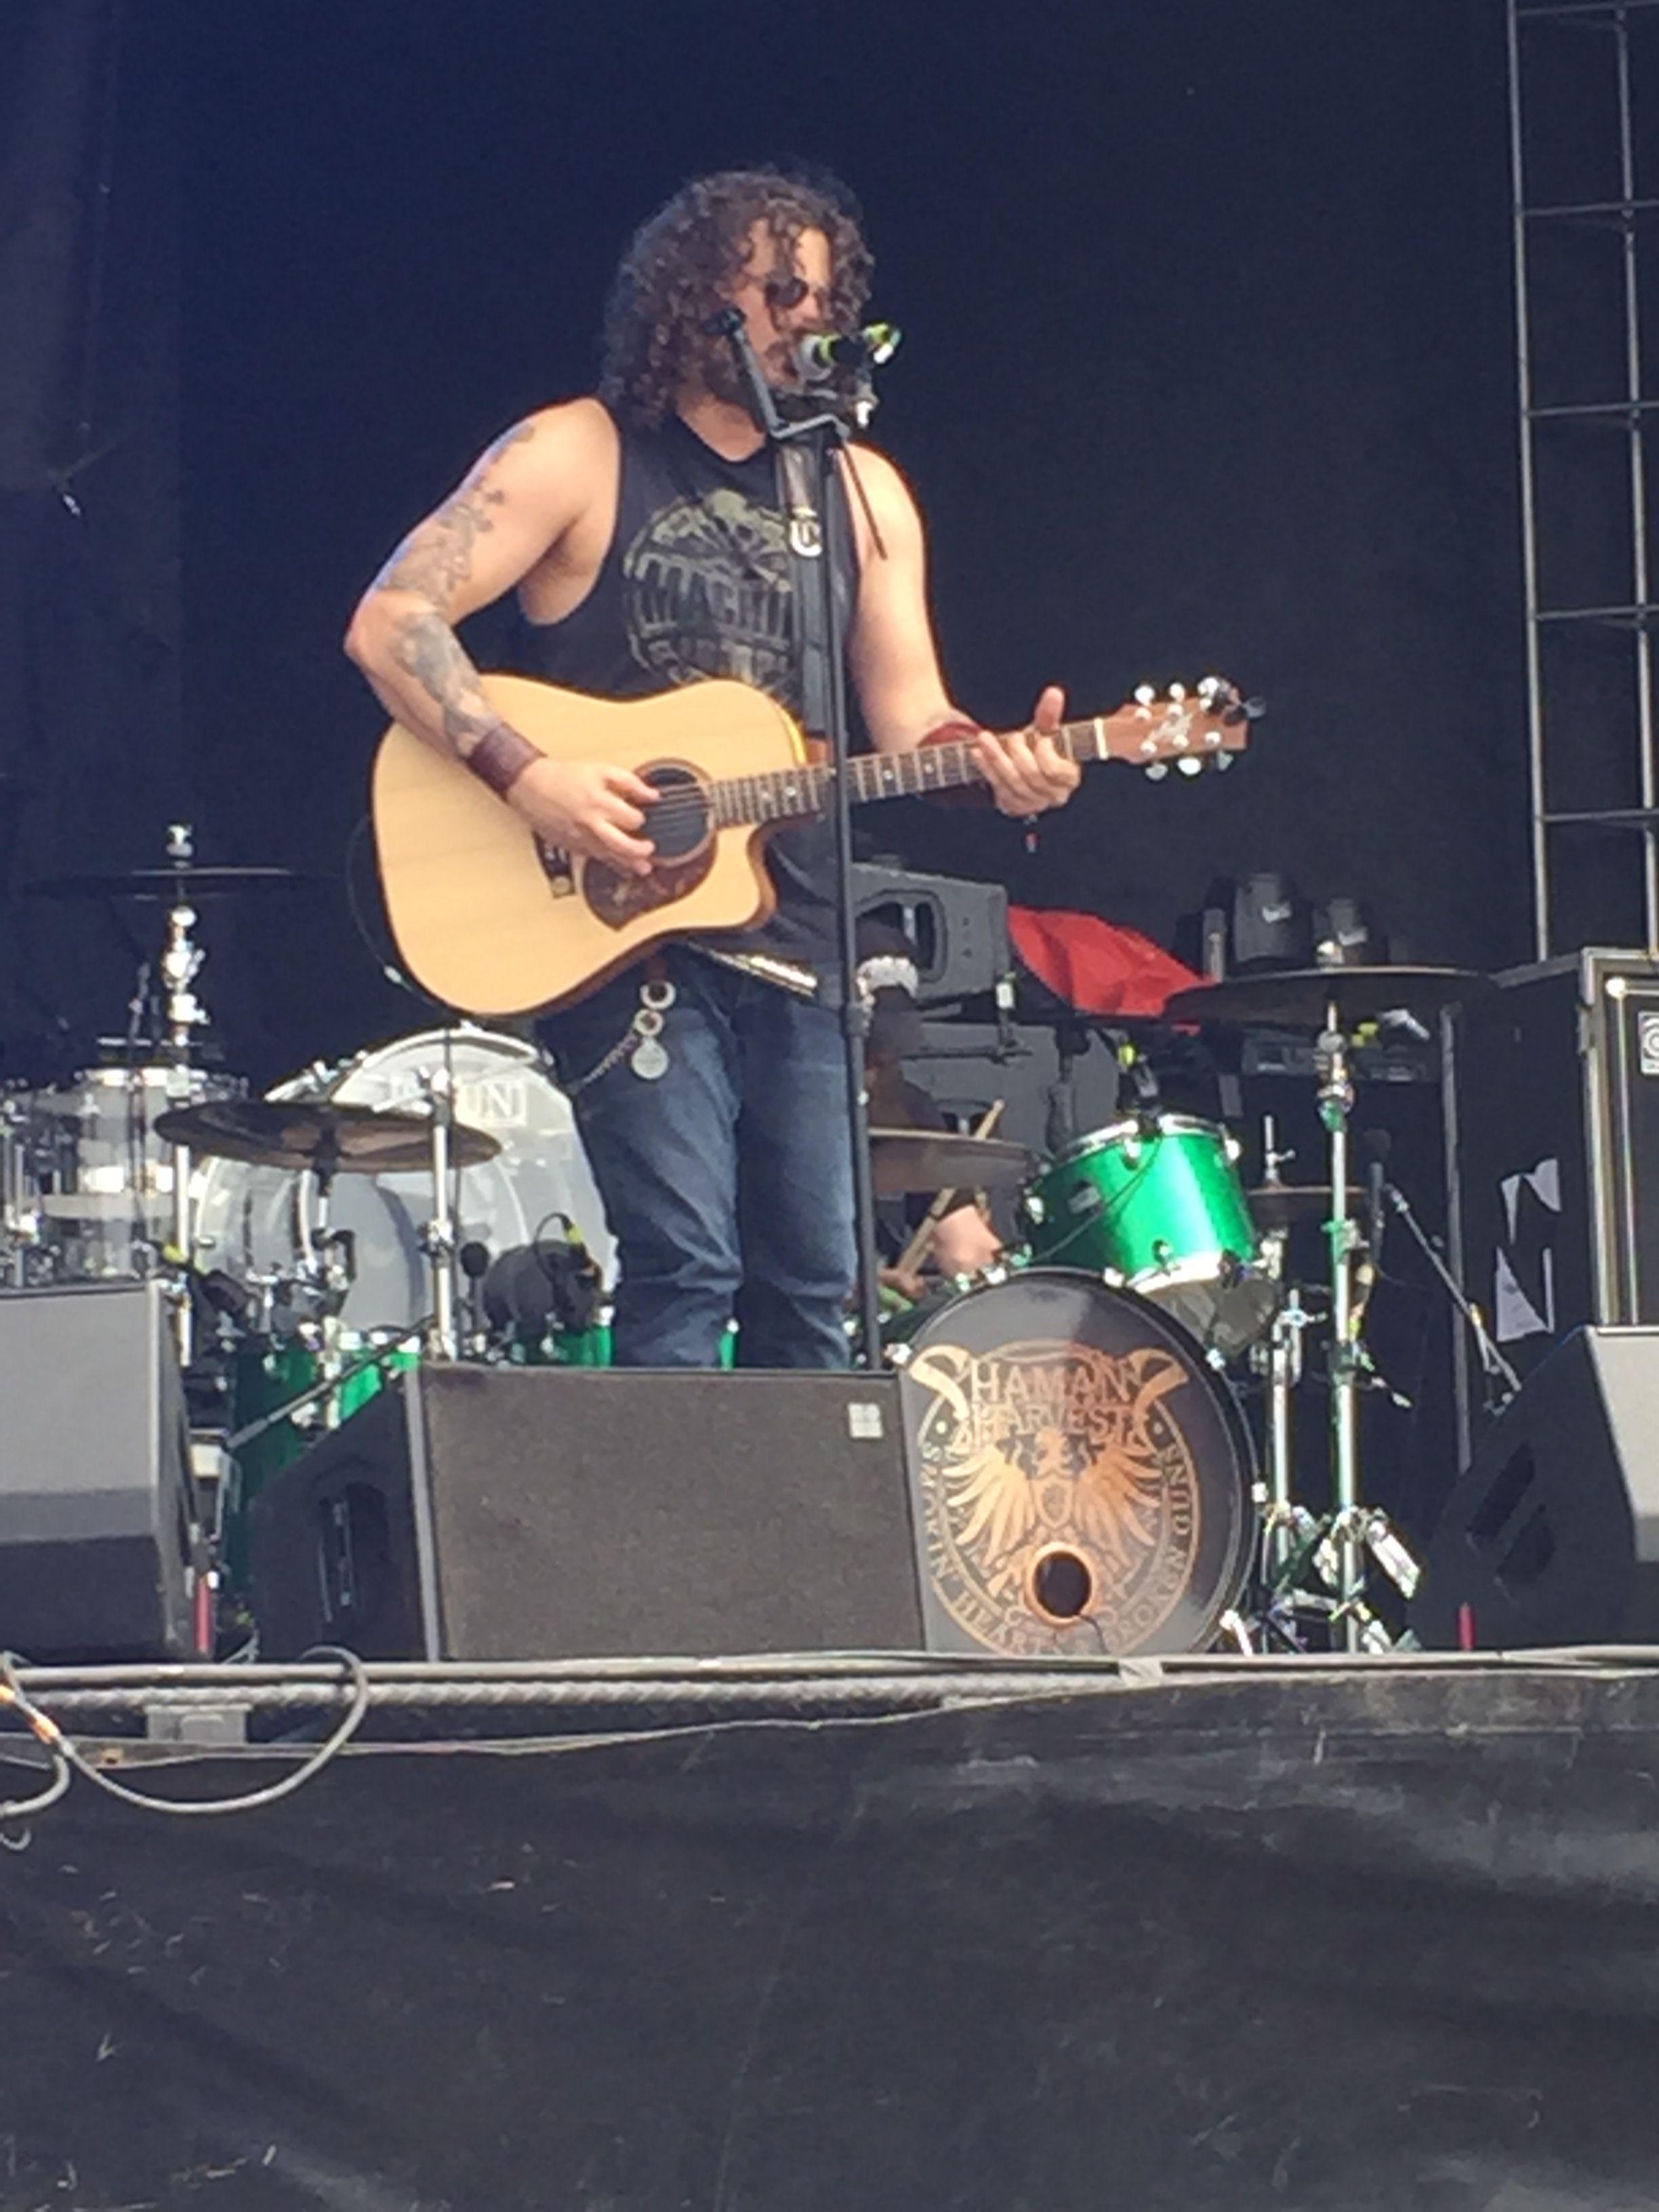 Shaman's Harvest at Rock on the Range in Ohio 5/15/2015